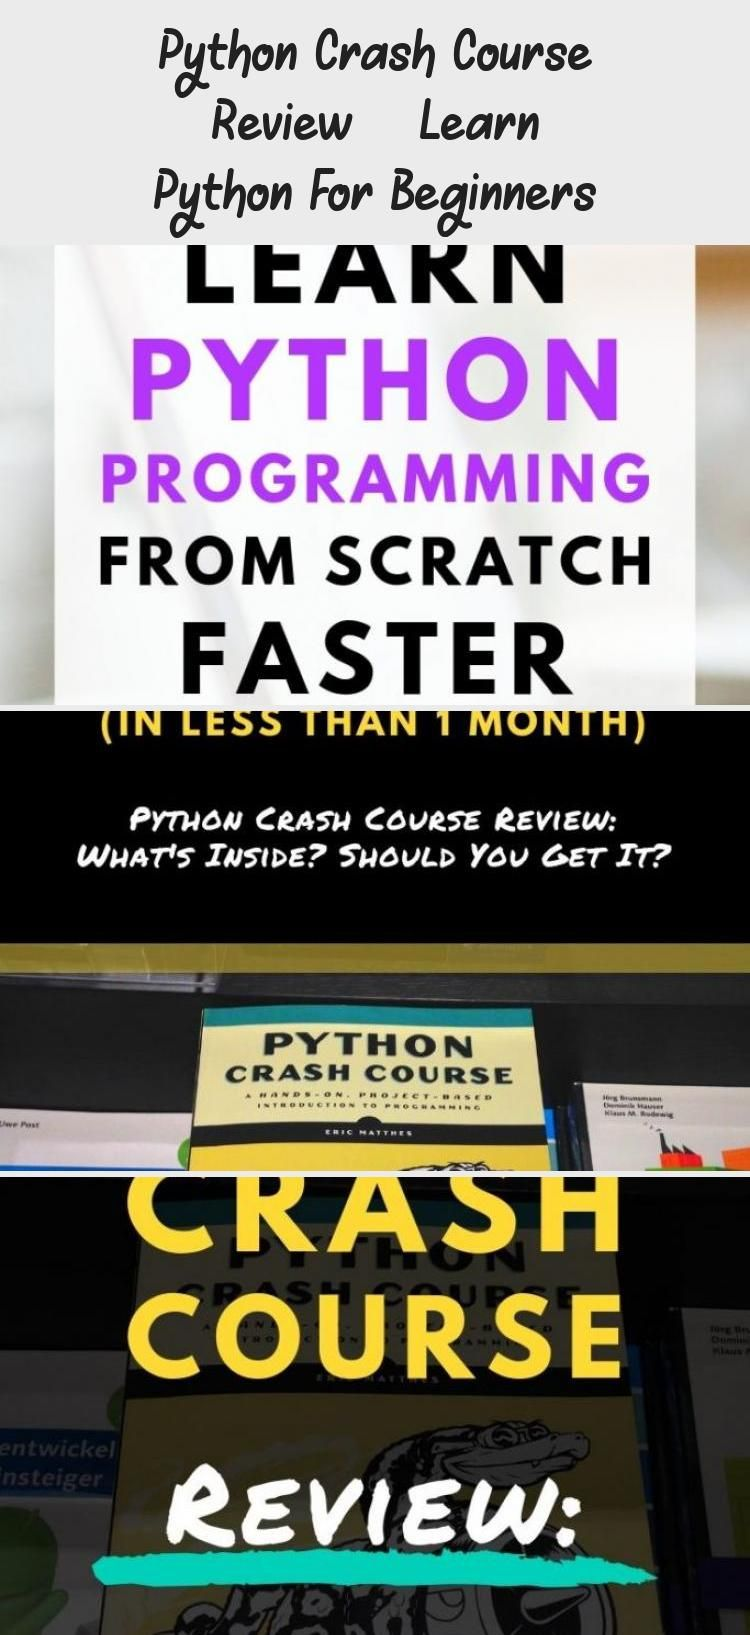 Python Crash Course Review Learn Python For Beginners Technology In 2020 Crash Course Course Review Learn Web Development